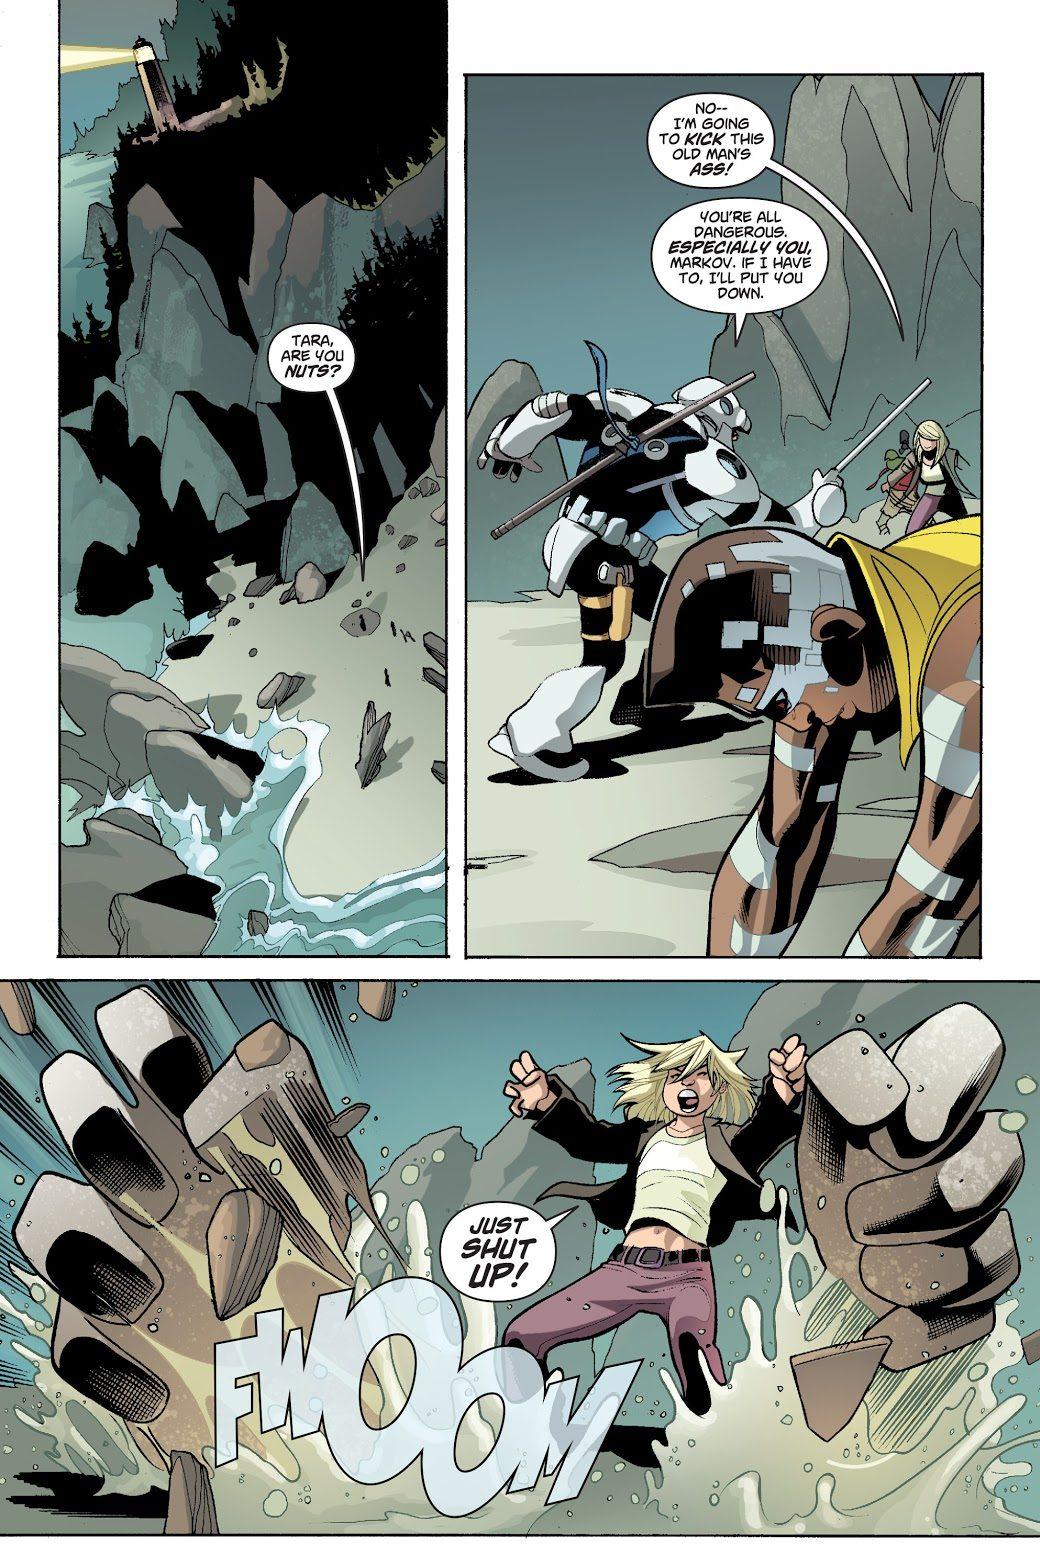 Deathstroke-VS-Teen-Titans-Teen-Titans-Earth-1